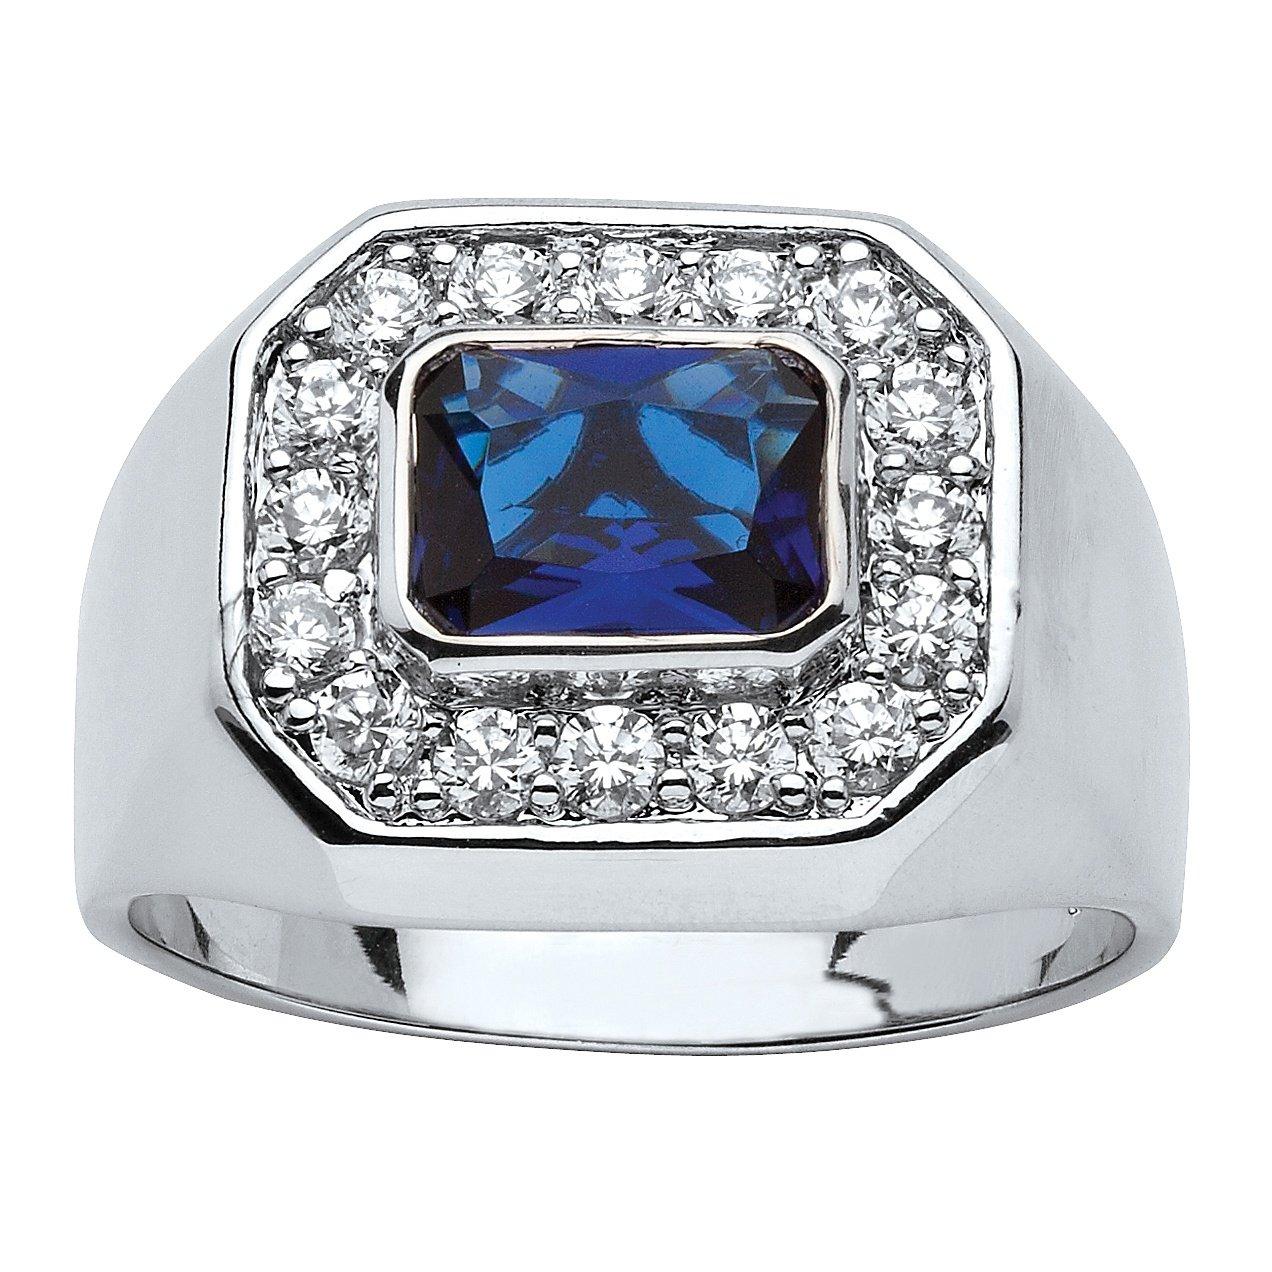 Palm Beach Jewelry Men's Silver Tone Blue Glass Round Cubic Zirconia Ring Size 11